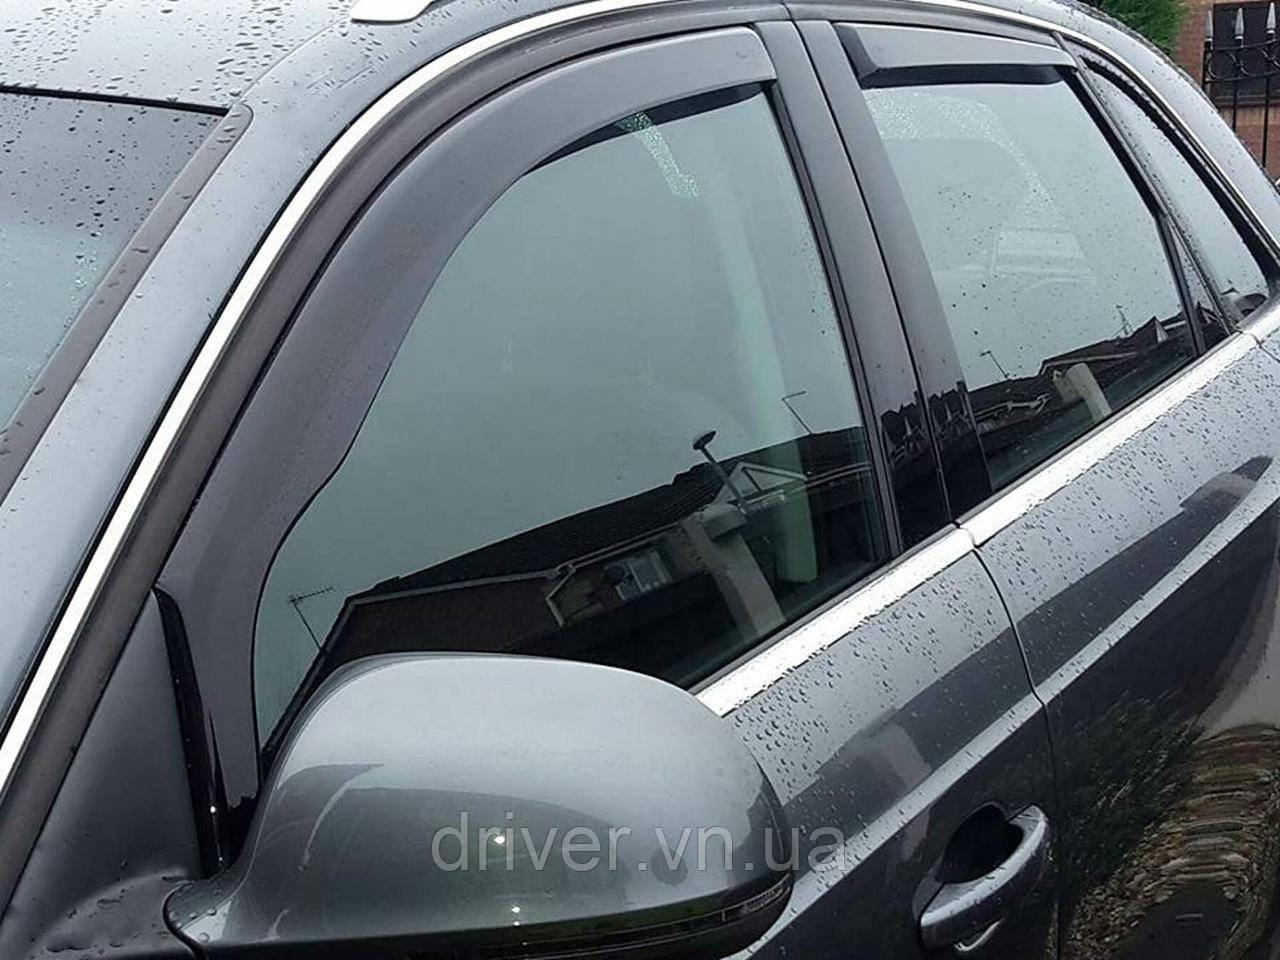 Дефлектори вікон вставні Audi Q5 2009 -> 5D